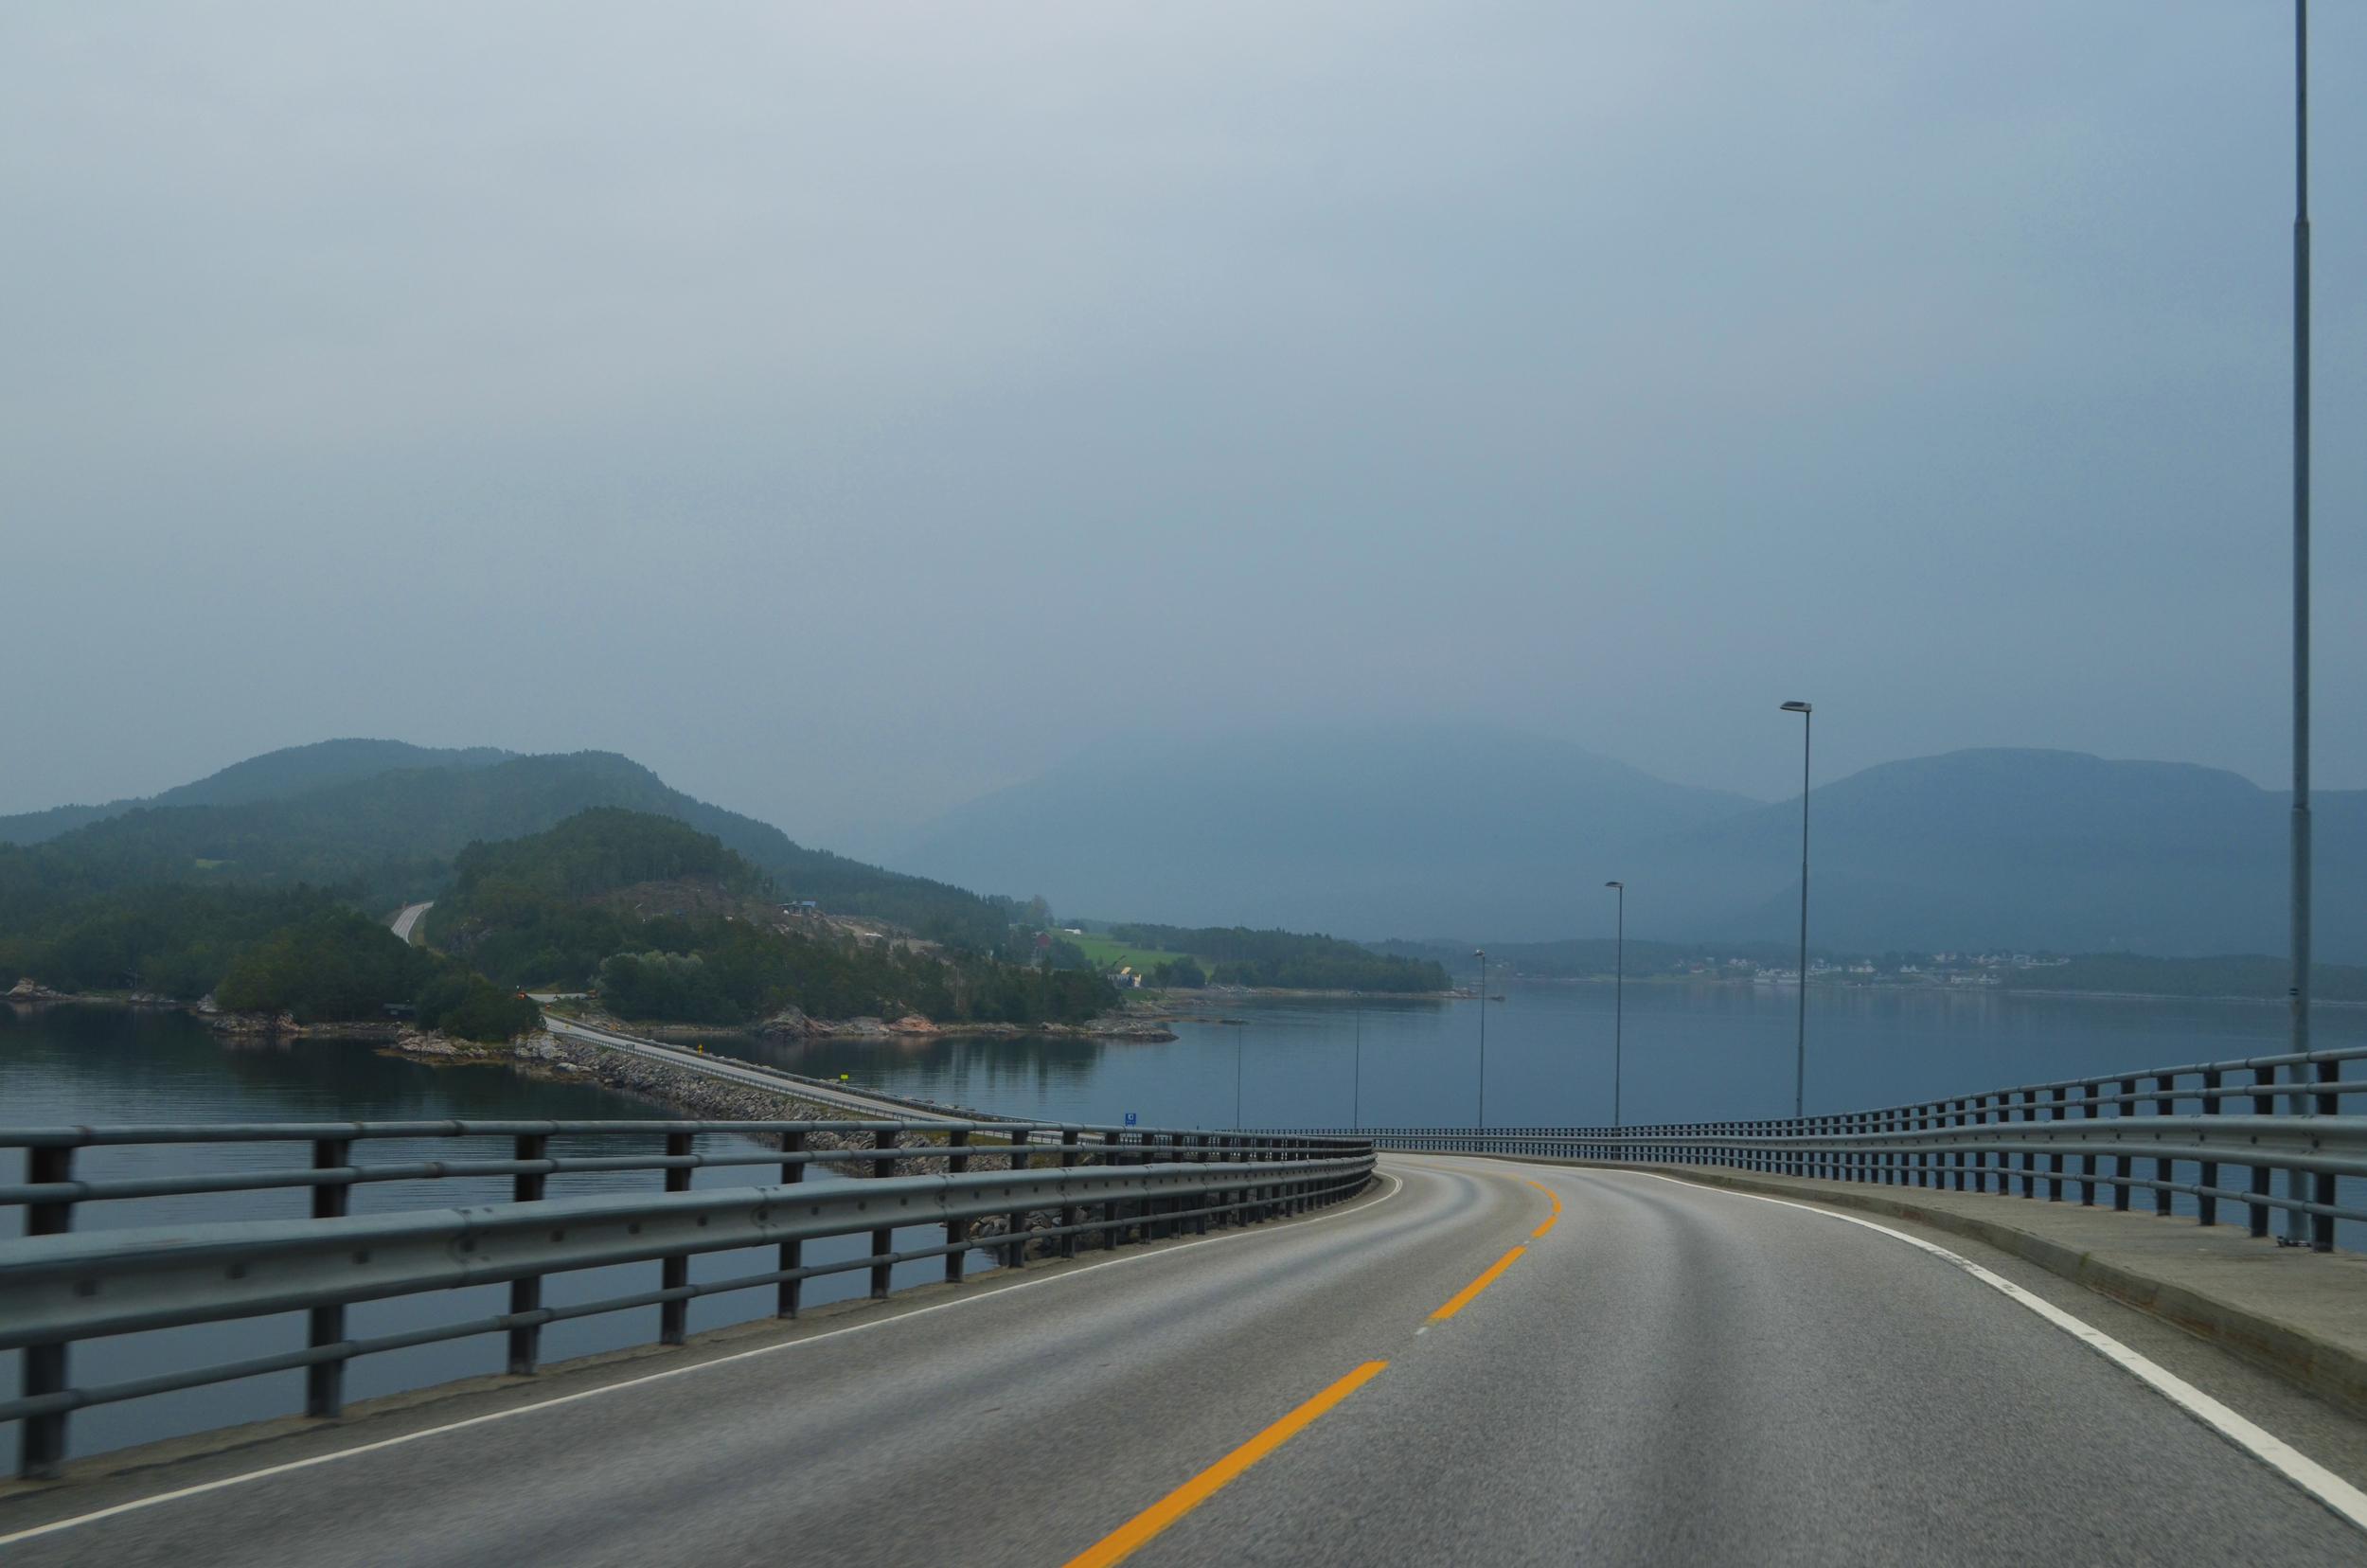 Islands and Bridges, Norway.